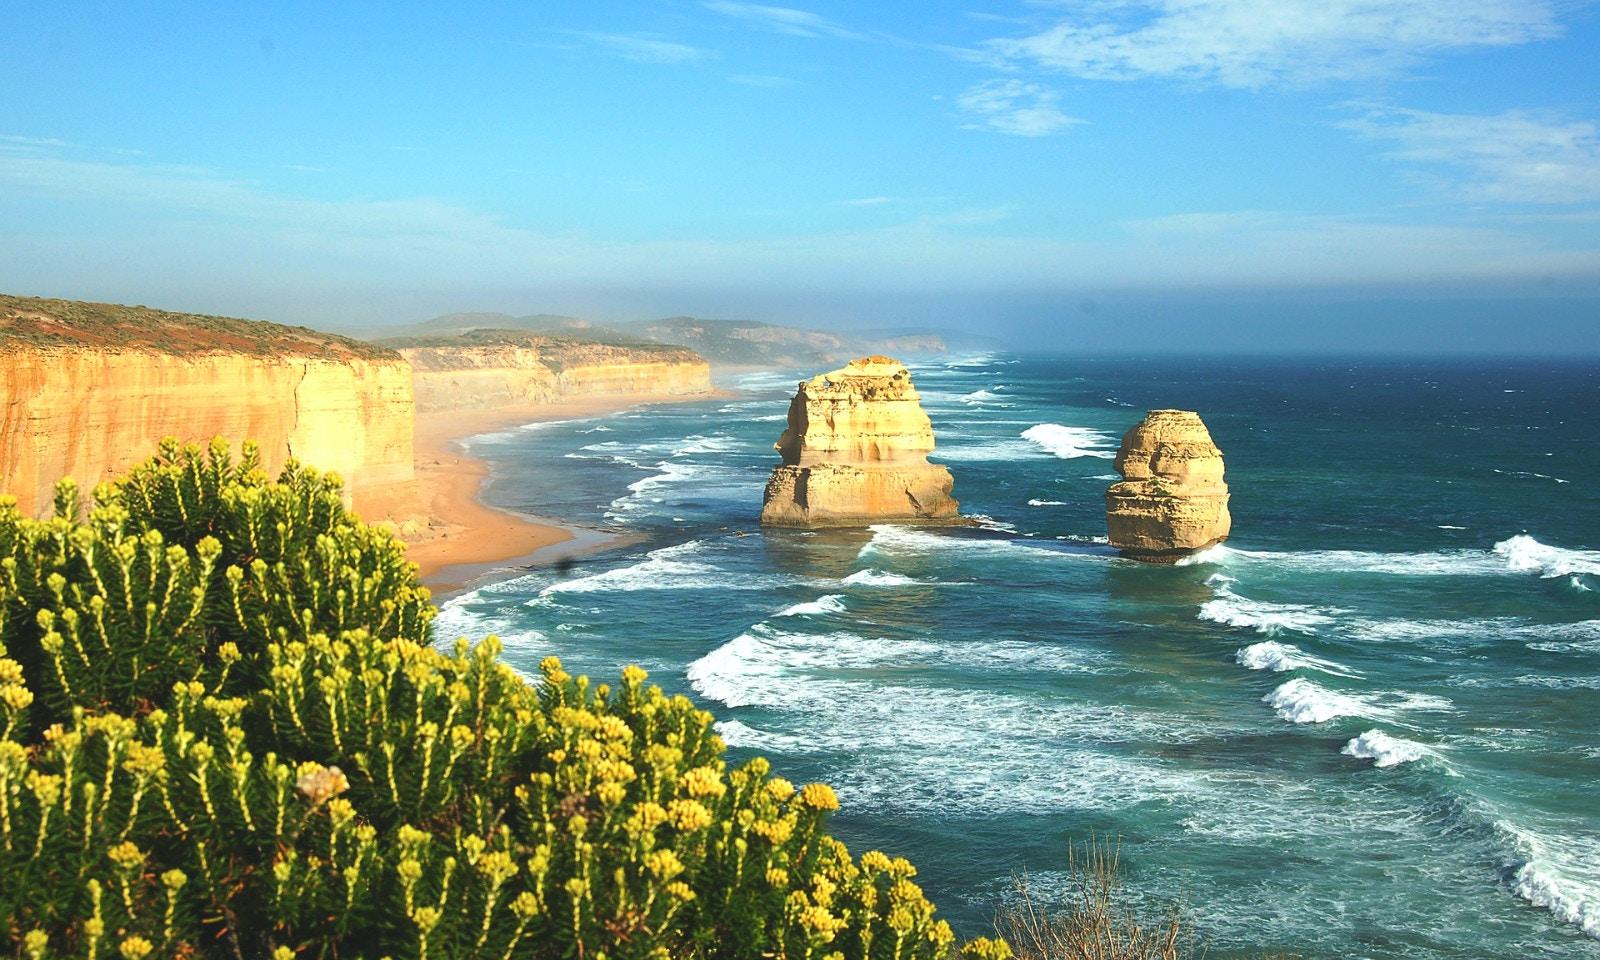 Vic. Govt. $9.8m investment backs major overhaul for bushfire impacted Shipwreck Coast